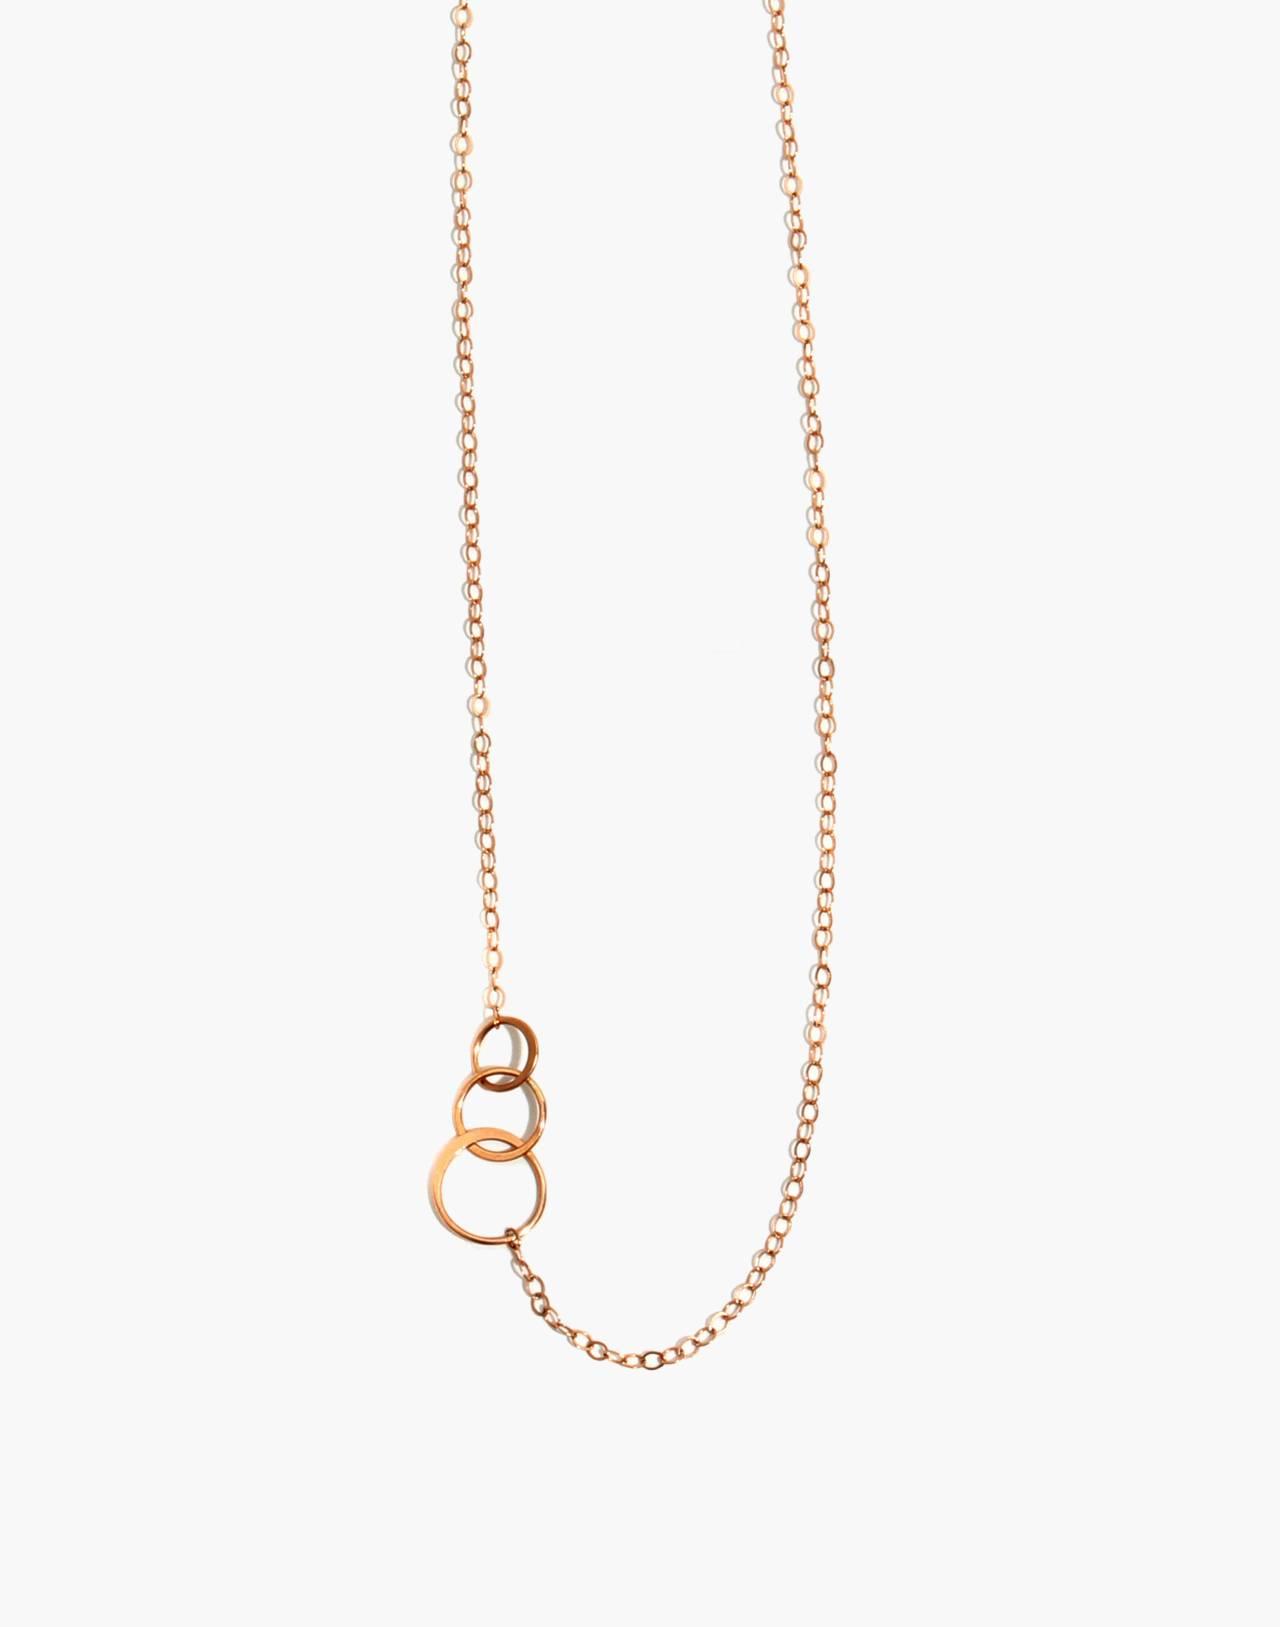 Melissa Joy Manning® 14k Gold Graduated Circle Necklace in gold image 1